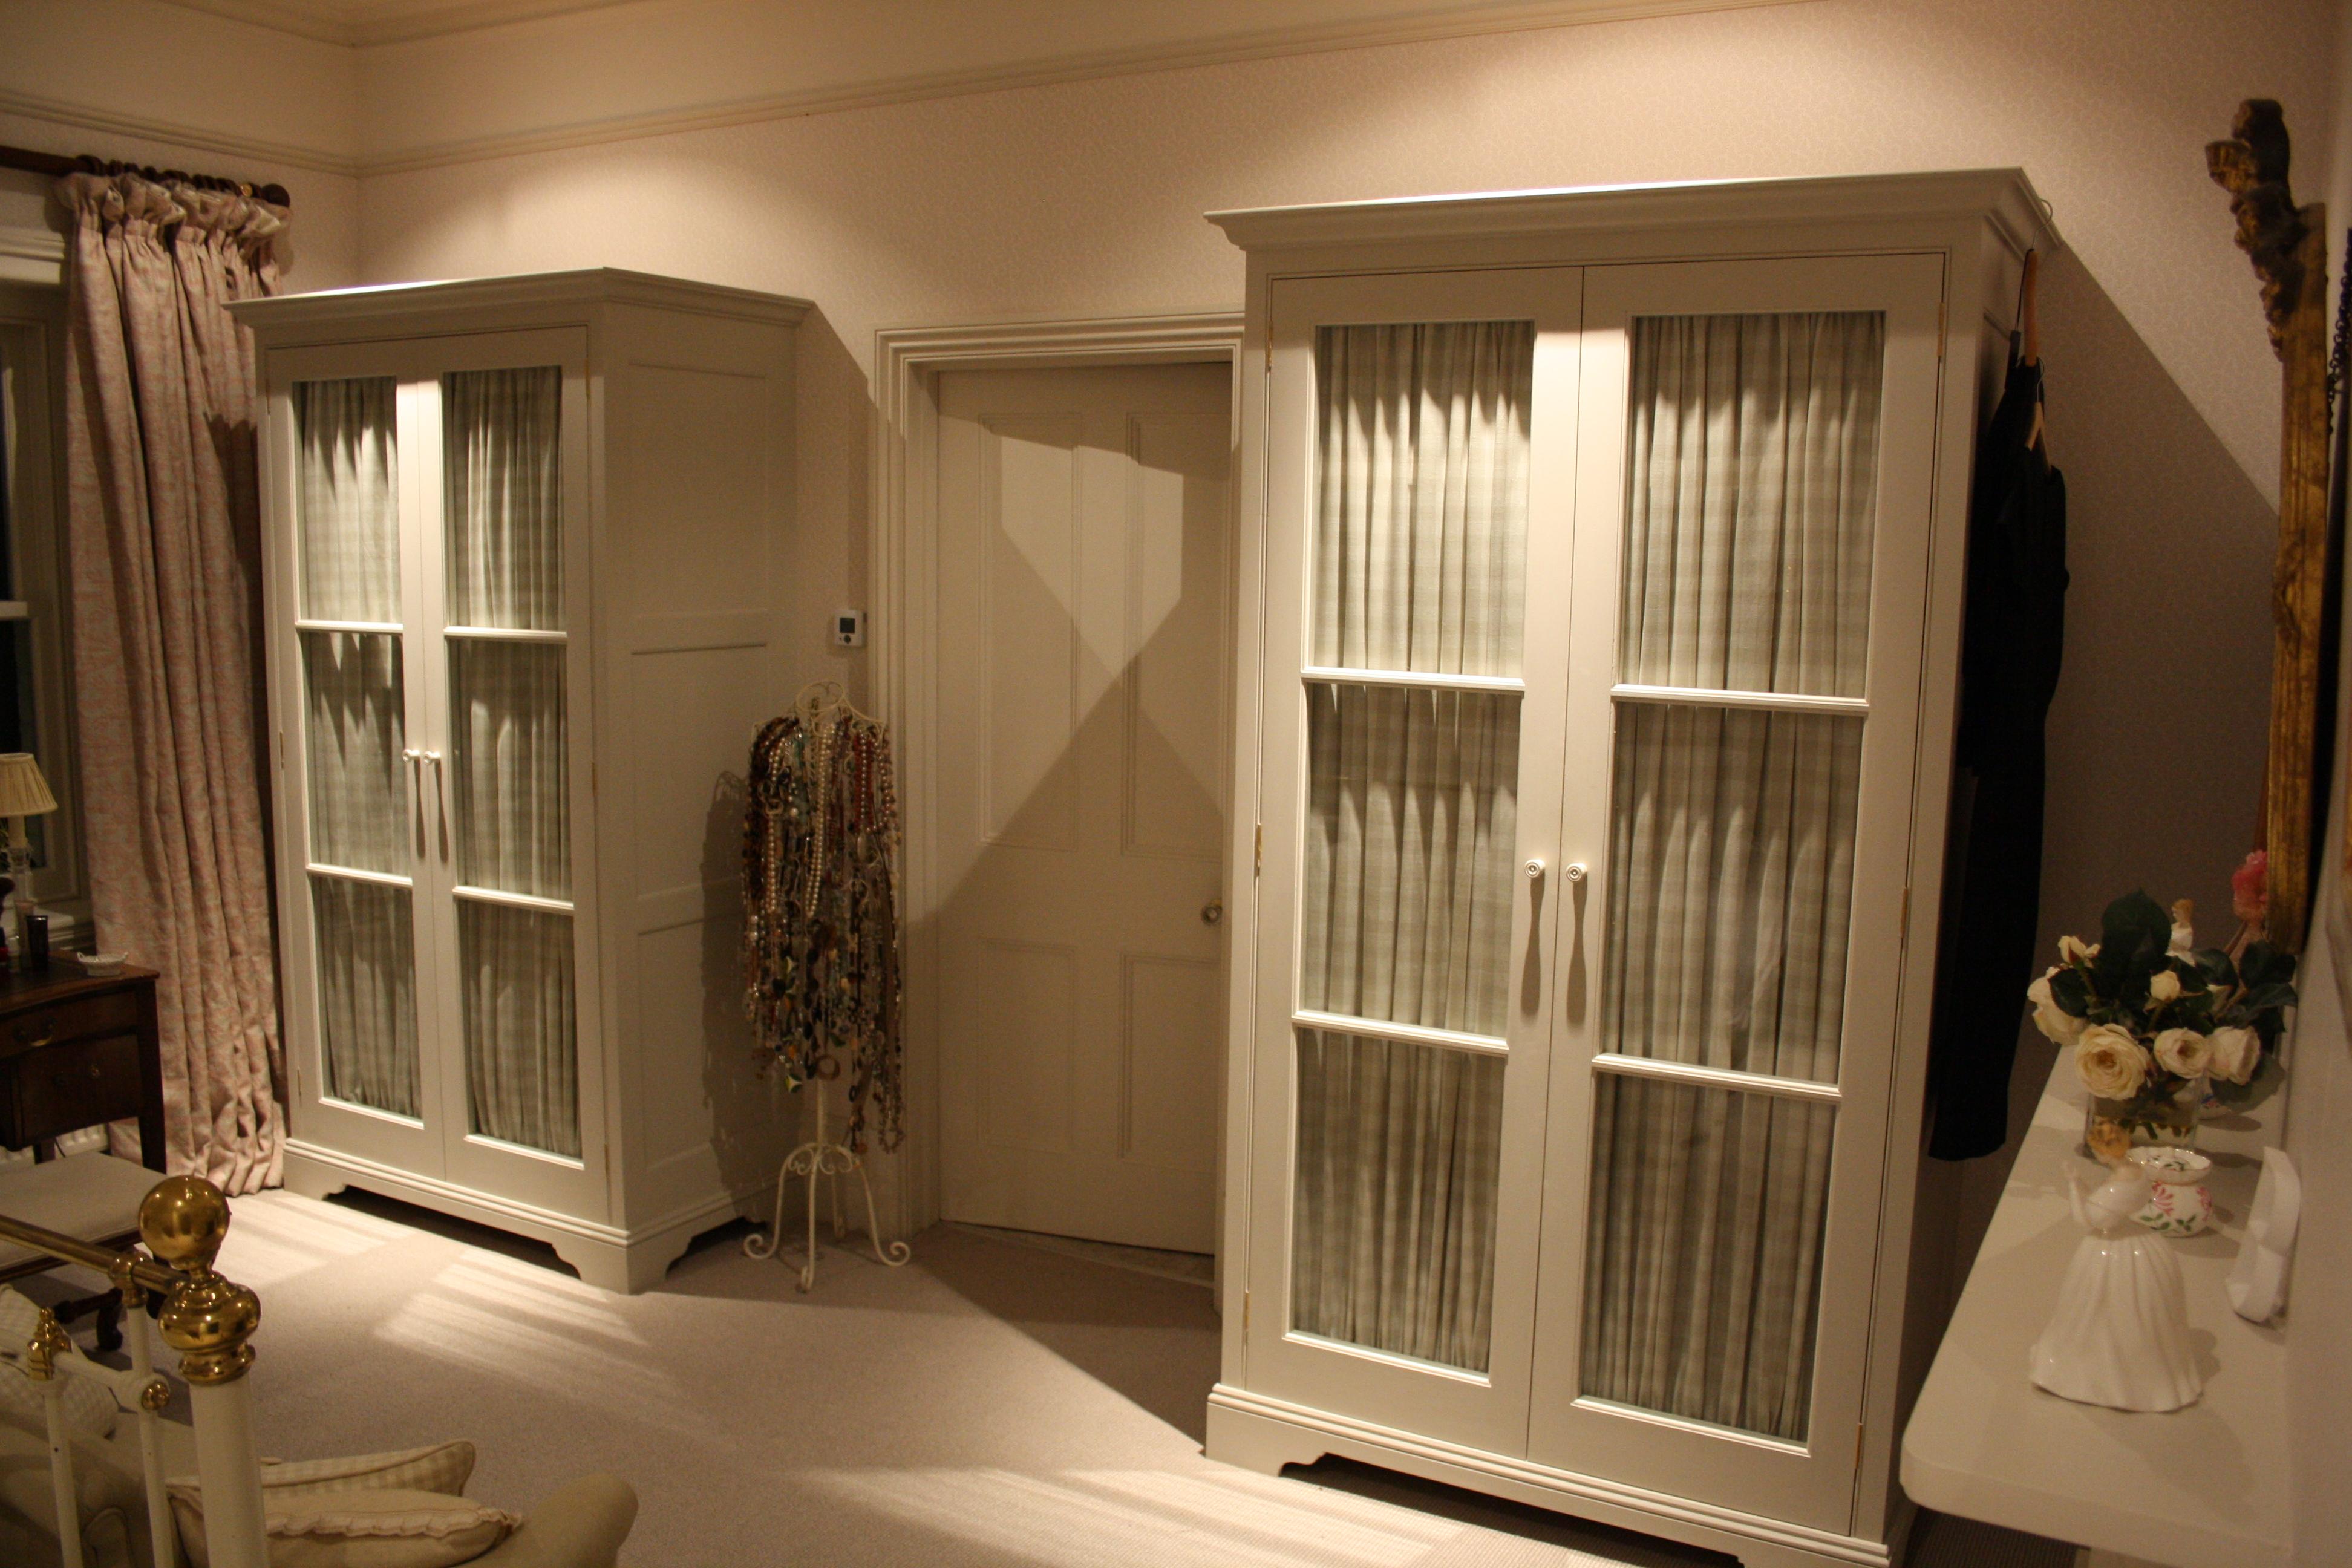 amusing bedroom wardrobes modern door oak designs sliding great rooms fitted hotel